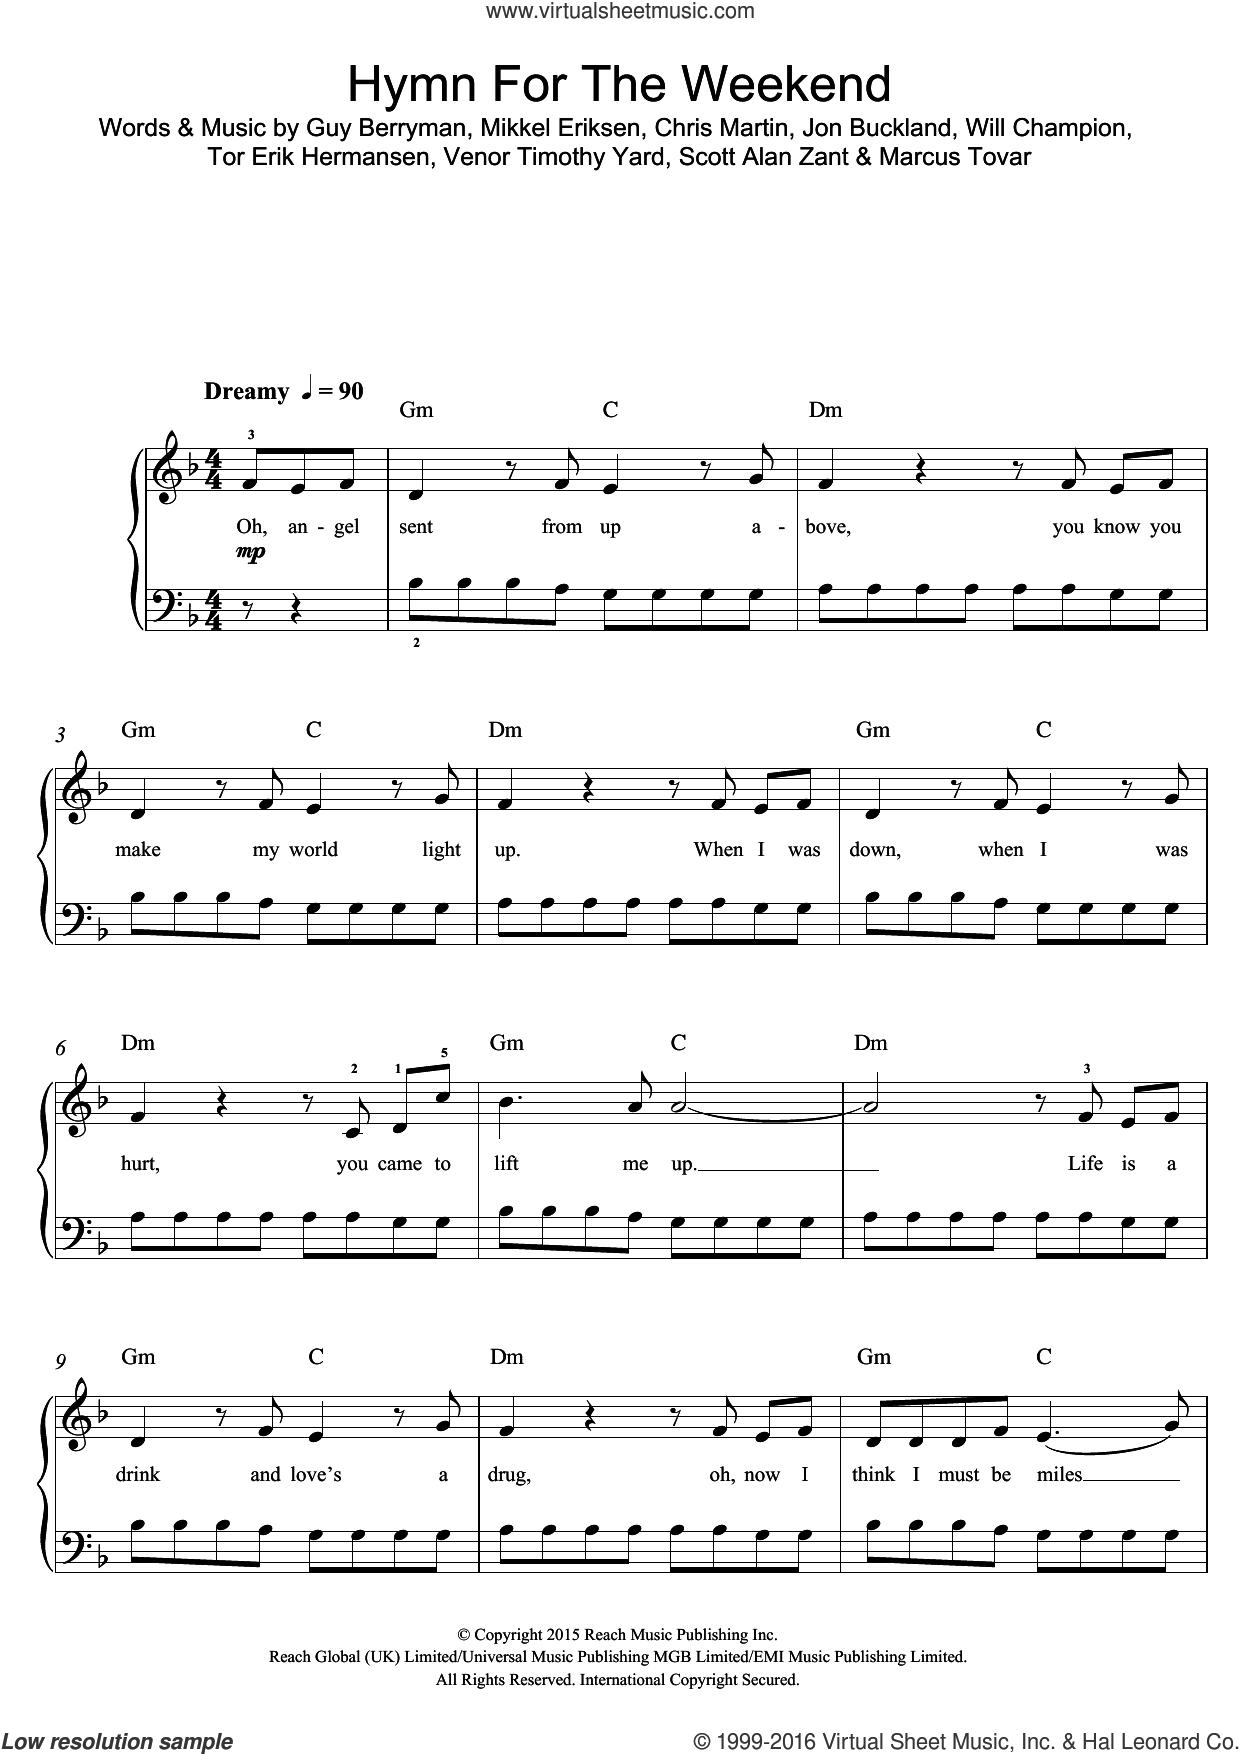 Hymn For The Weekend sheet music for voice, piano or guitar by Coldplay, Chris Martin, Guy Berryman, Jon Buckland, Marcus Tovar, Mikkel Eriksen, Scott Alan Zant, Tor Erik Hermansen, Venor Timothy Yard and Will Champion, intermediate skill level